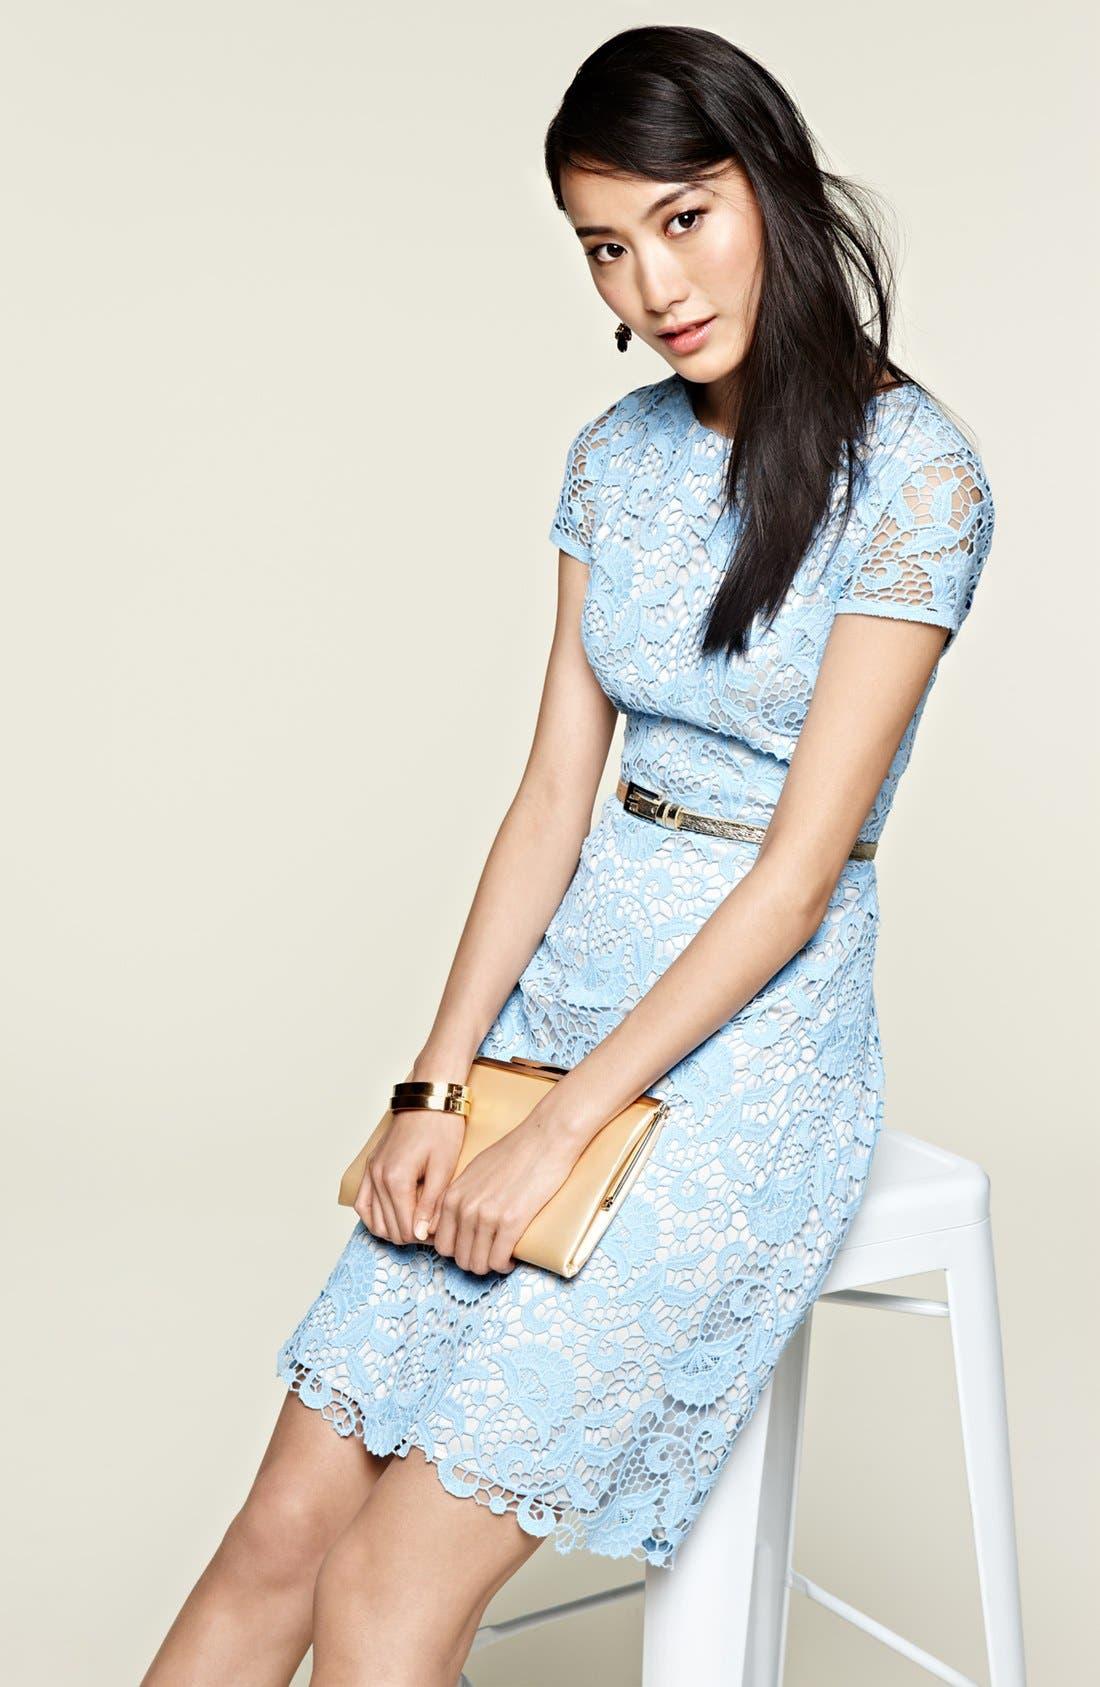 Alternate Image 1 Selected - Eliza J Lace Dress & Accessories